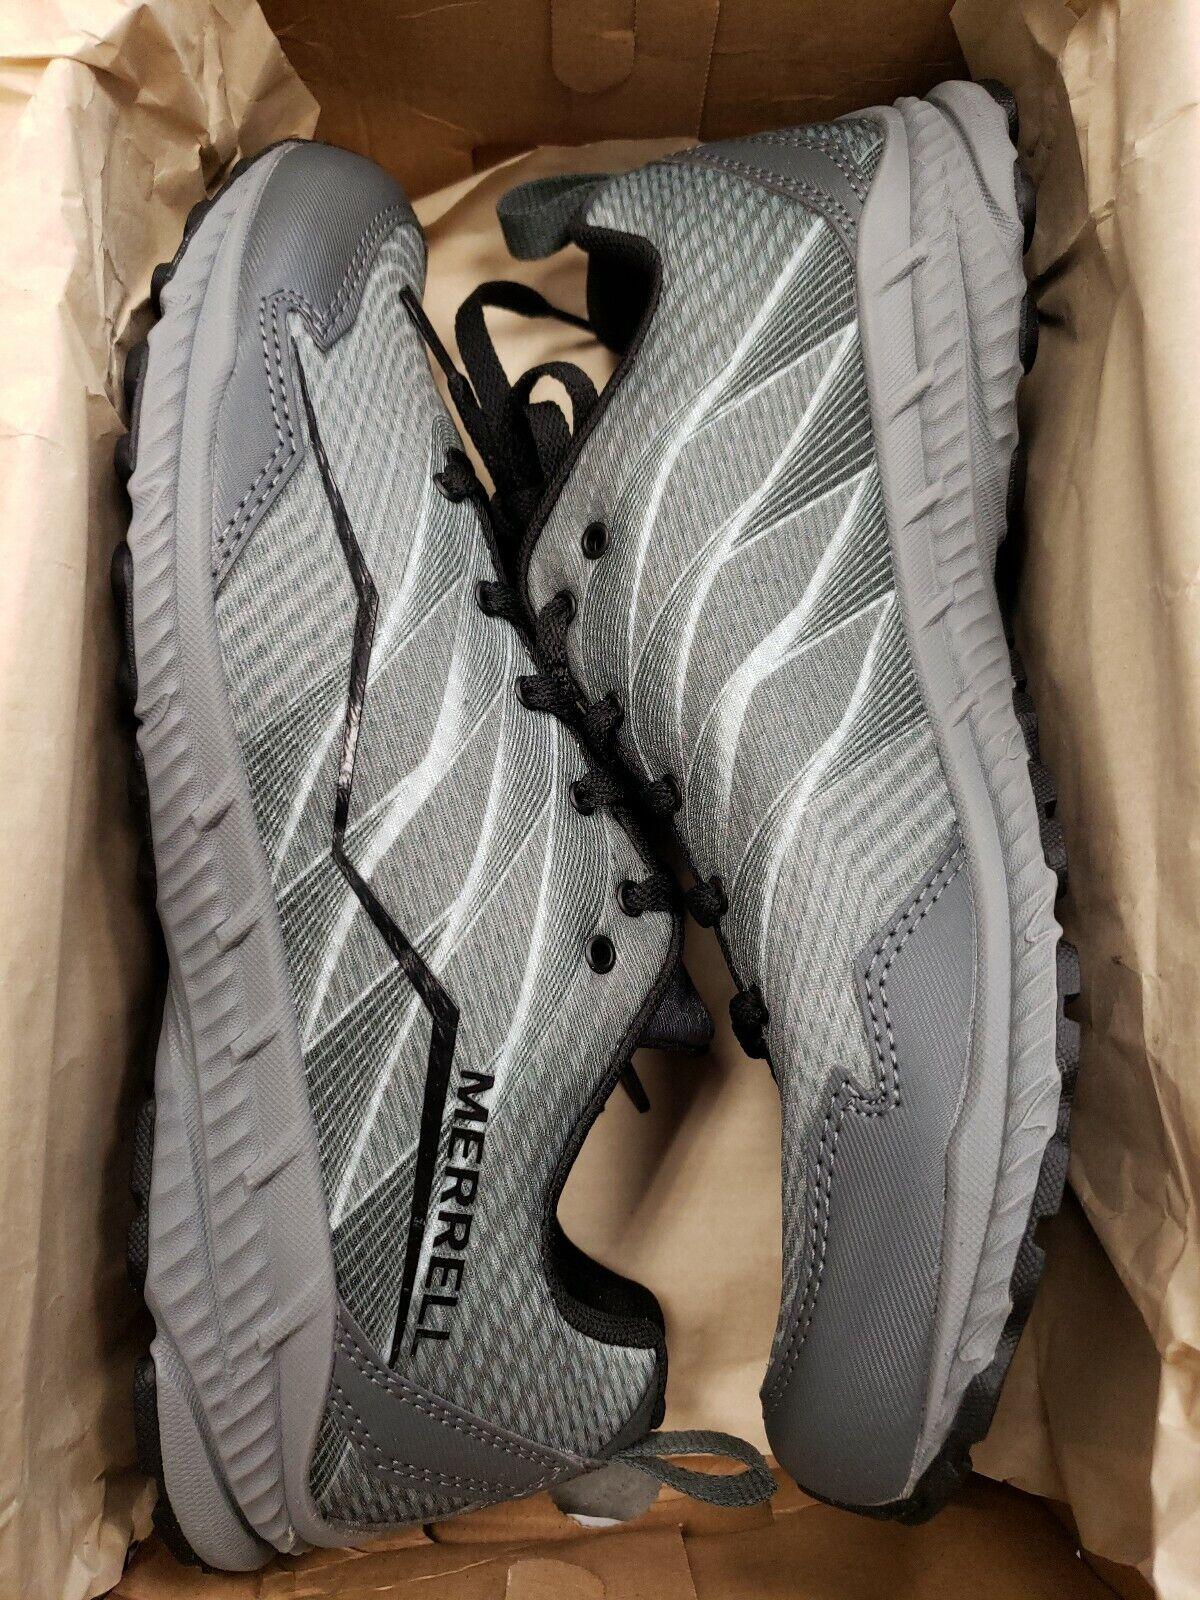 Merrell Para  Hombre Trail trituradora de trail Corriendo hombre talla  8M Color gris retorno Set 2  venta caliente